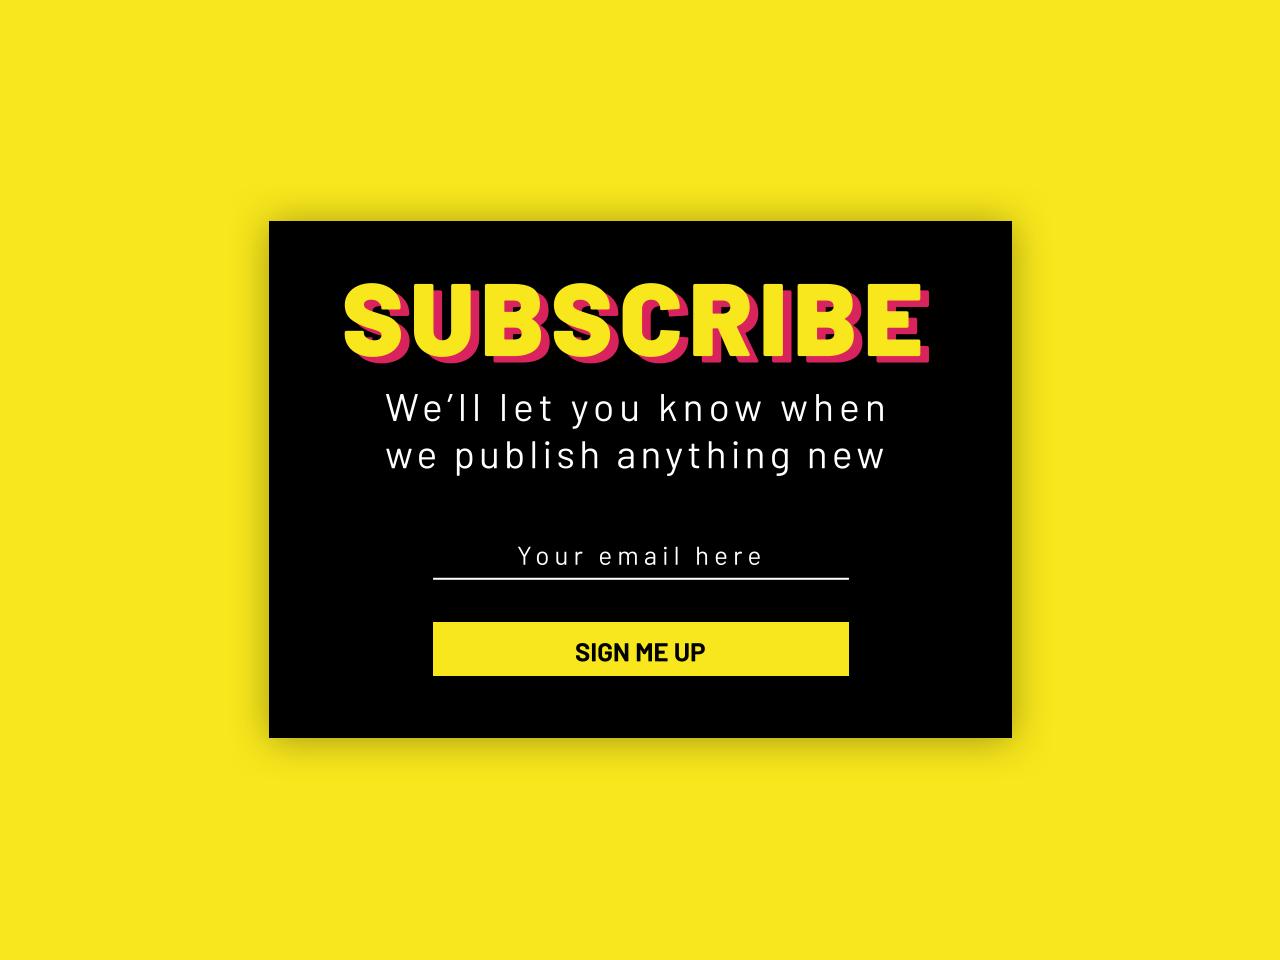 Subscribe Newsletter Sign up uiux ux design ux ui minimal sign up signup trending recent today mobile web web web newsletter subscribe newsletter yellow mangobaaz design design a day subscribe newsletter